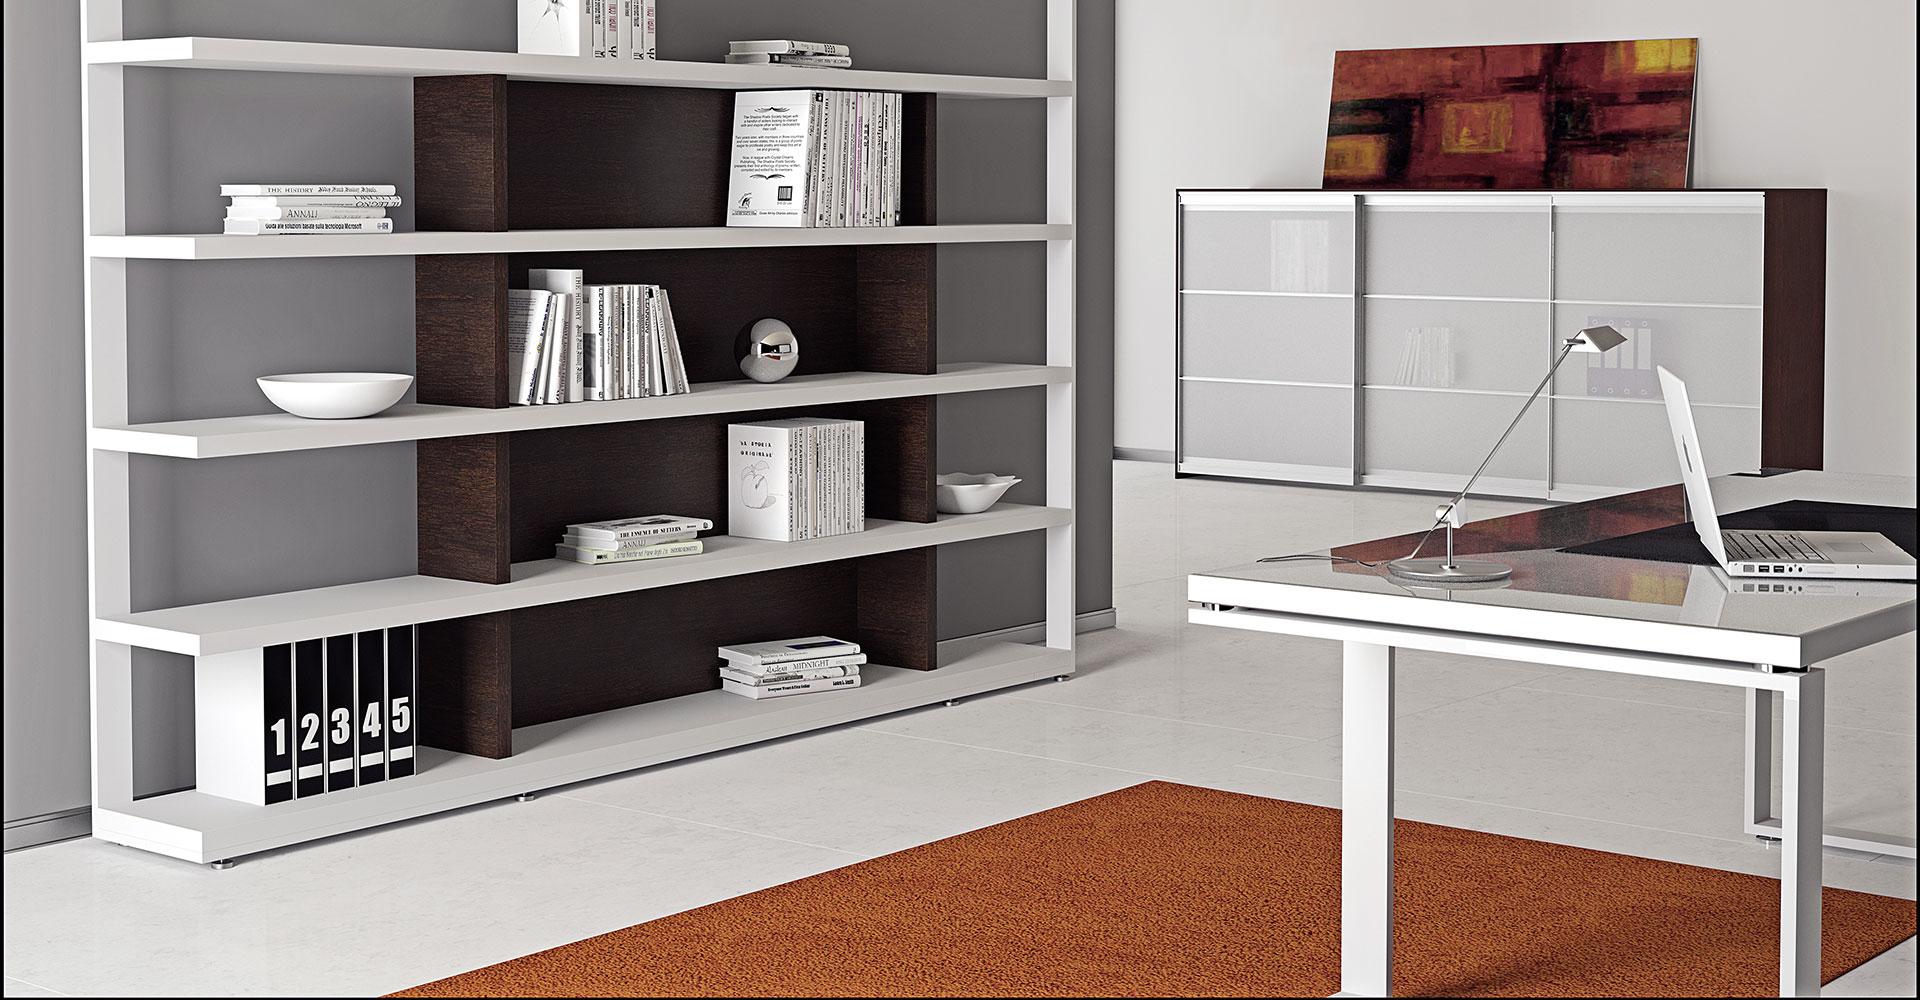 fond nosvaleurs referenceburo reference buro mobilier de bureau besancon fauteuil de. Black Bedroom Furniture Sets. Home Design Ideas